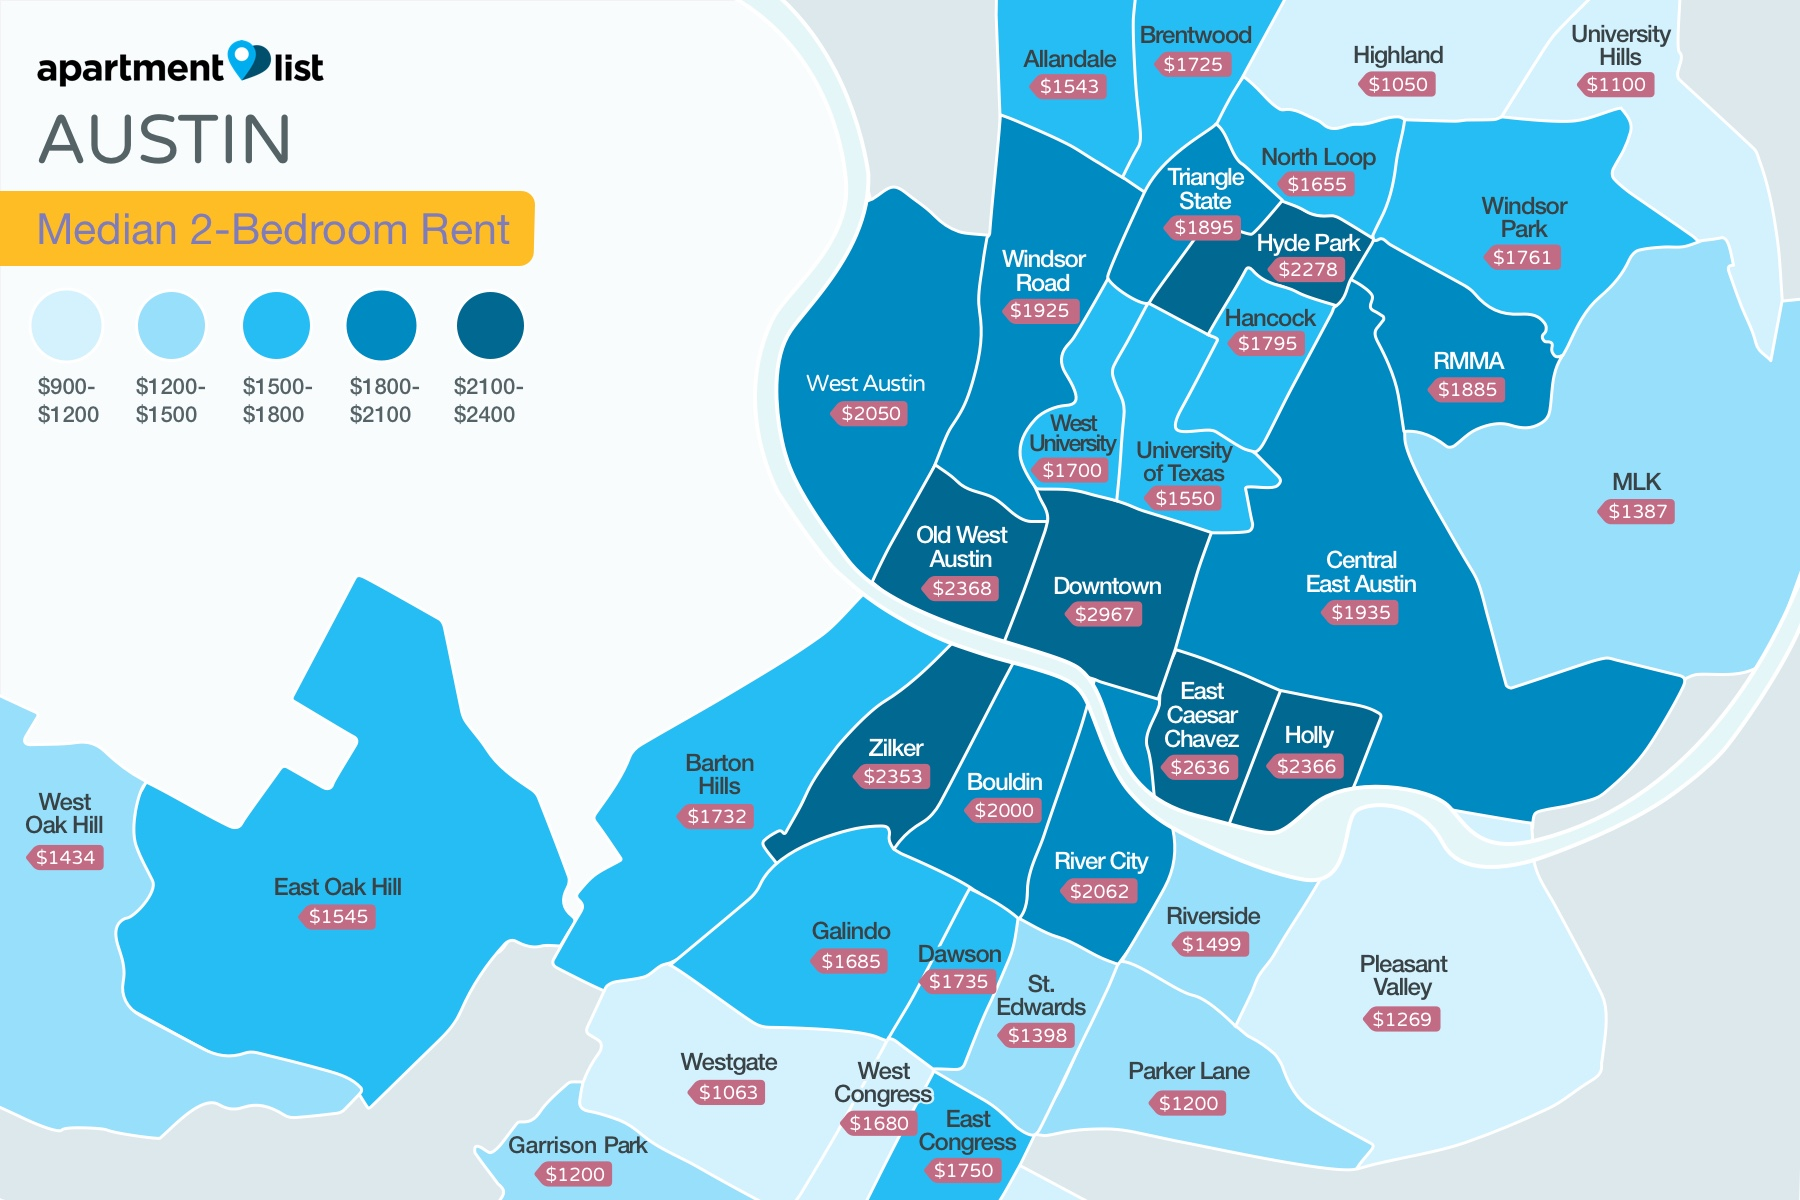 Austin Neighborhood Price Map